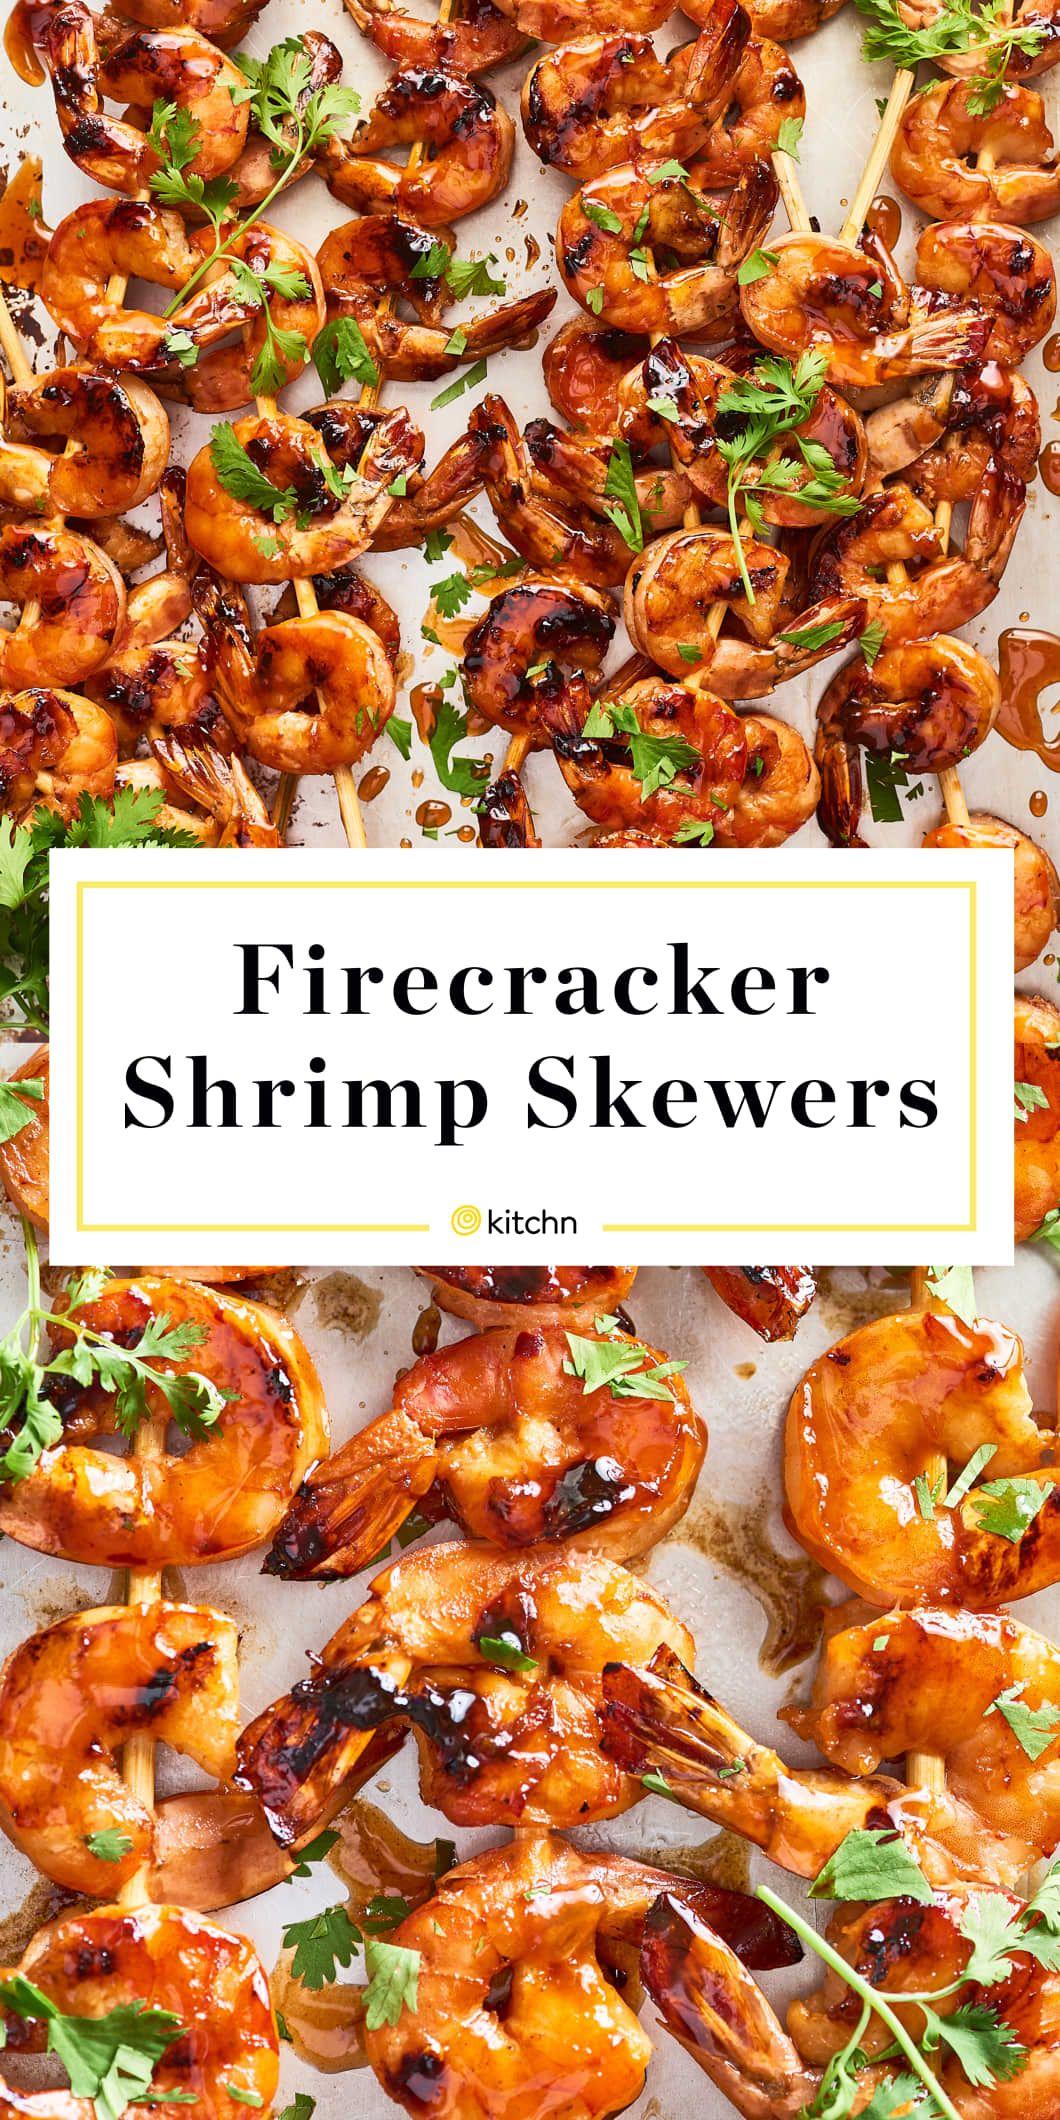 Recipe: Firecracker Shrimp Skewers